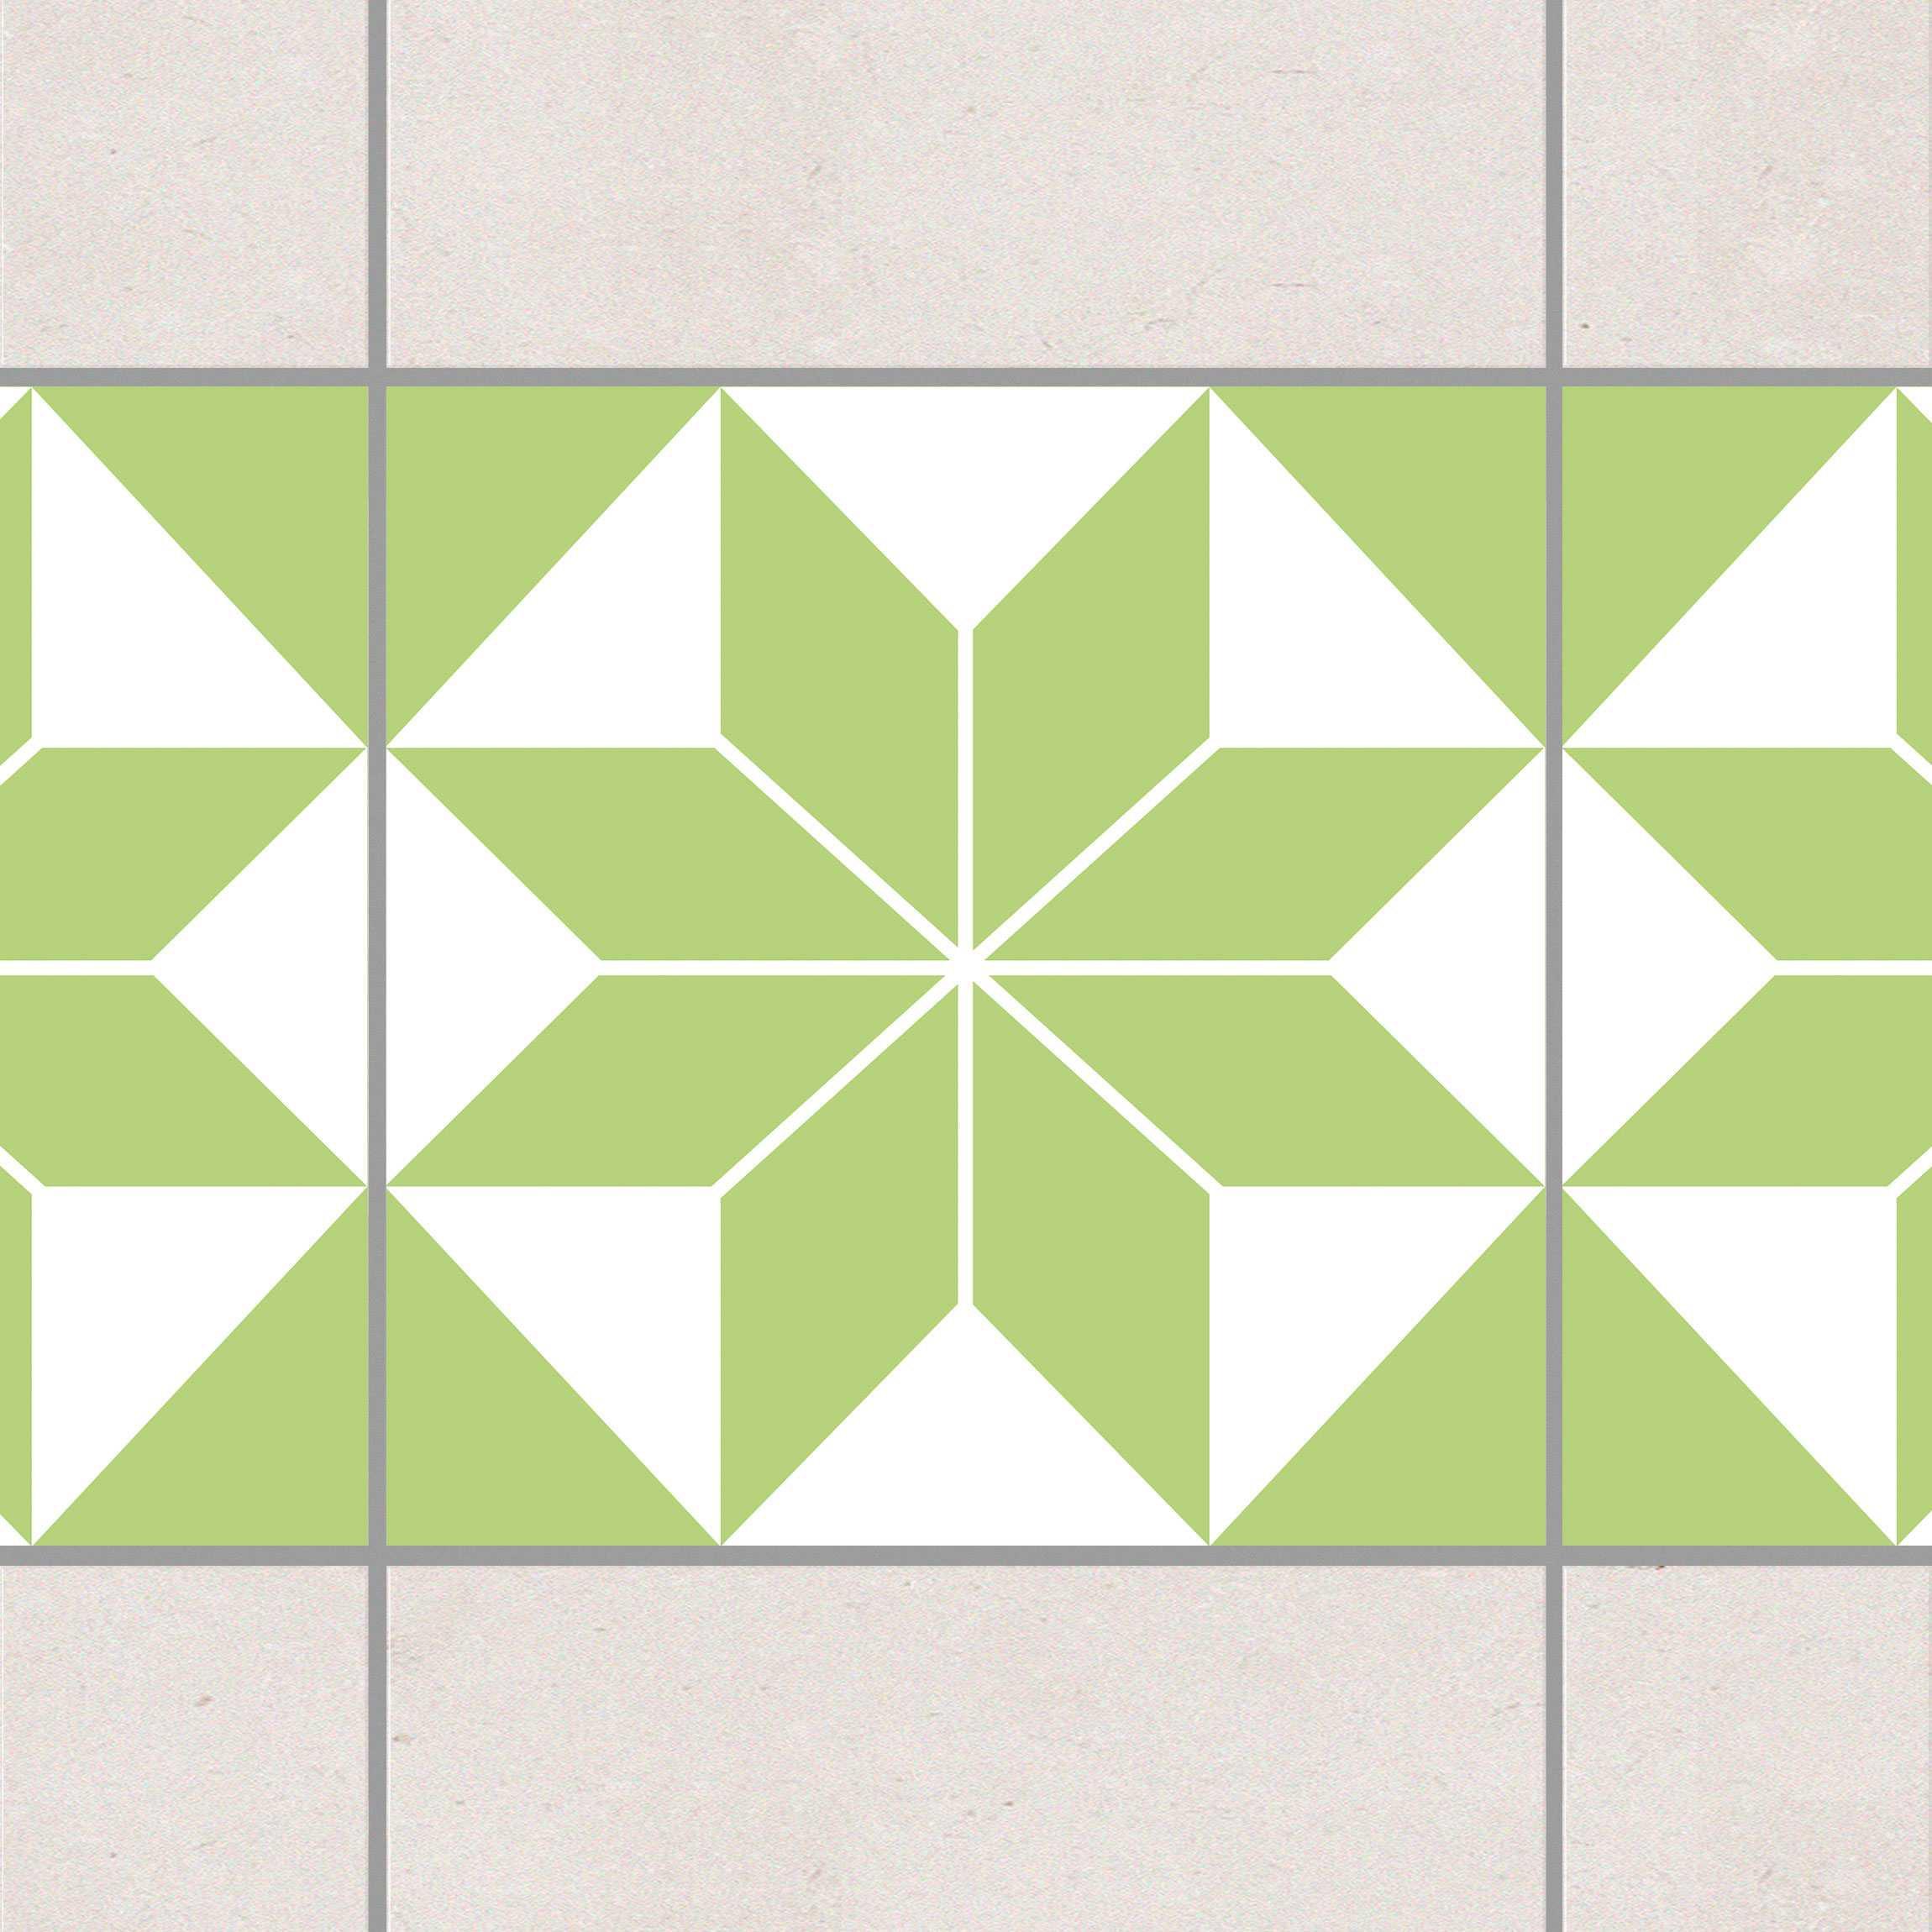 fliesen bord re sternenmuster spring green 20x20 cm fliesenaufkleber gr n. Black Bedroom Furniture Sets. Home Design Ideas